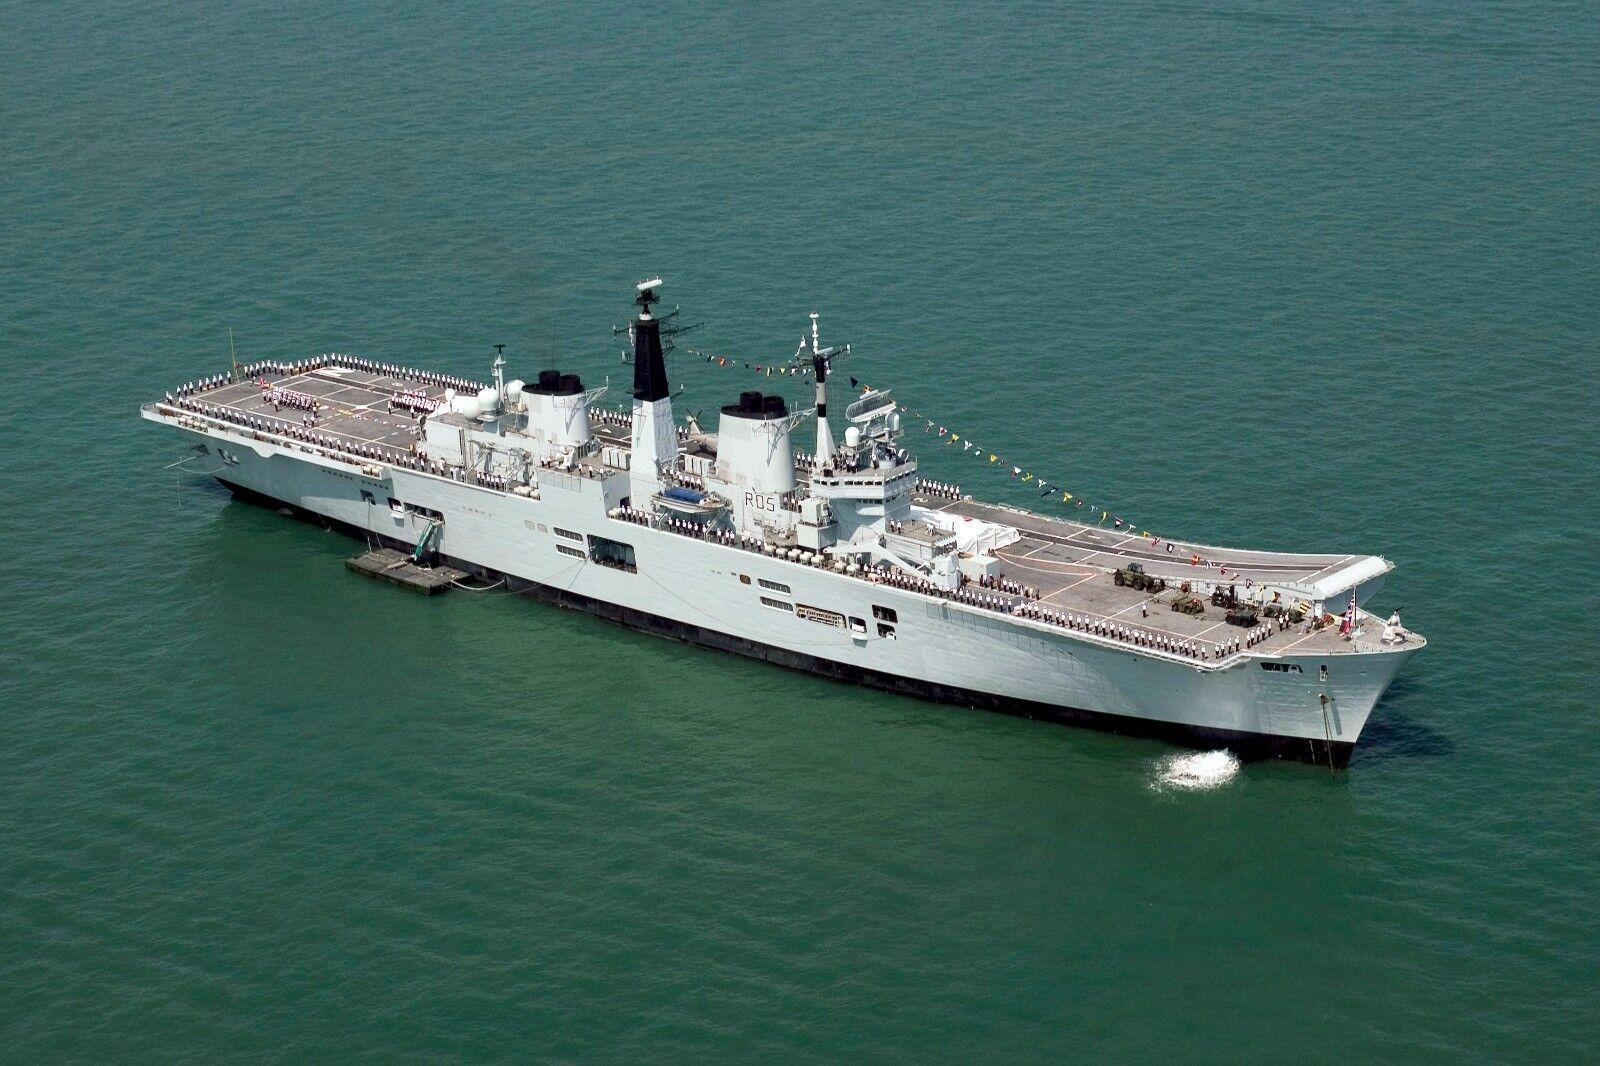 Aircraft Carrier HMS Invincible Photo Print